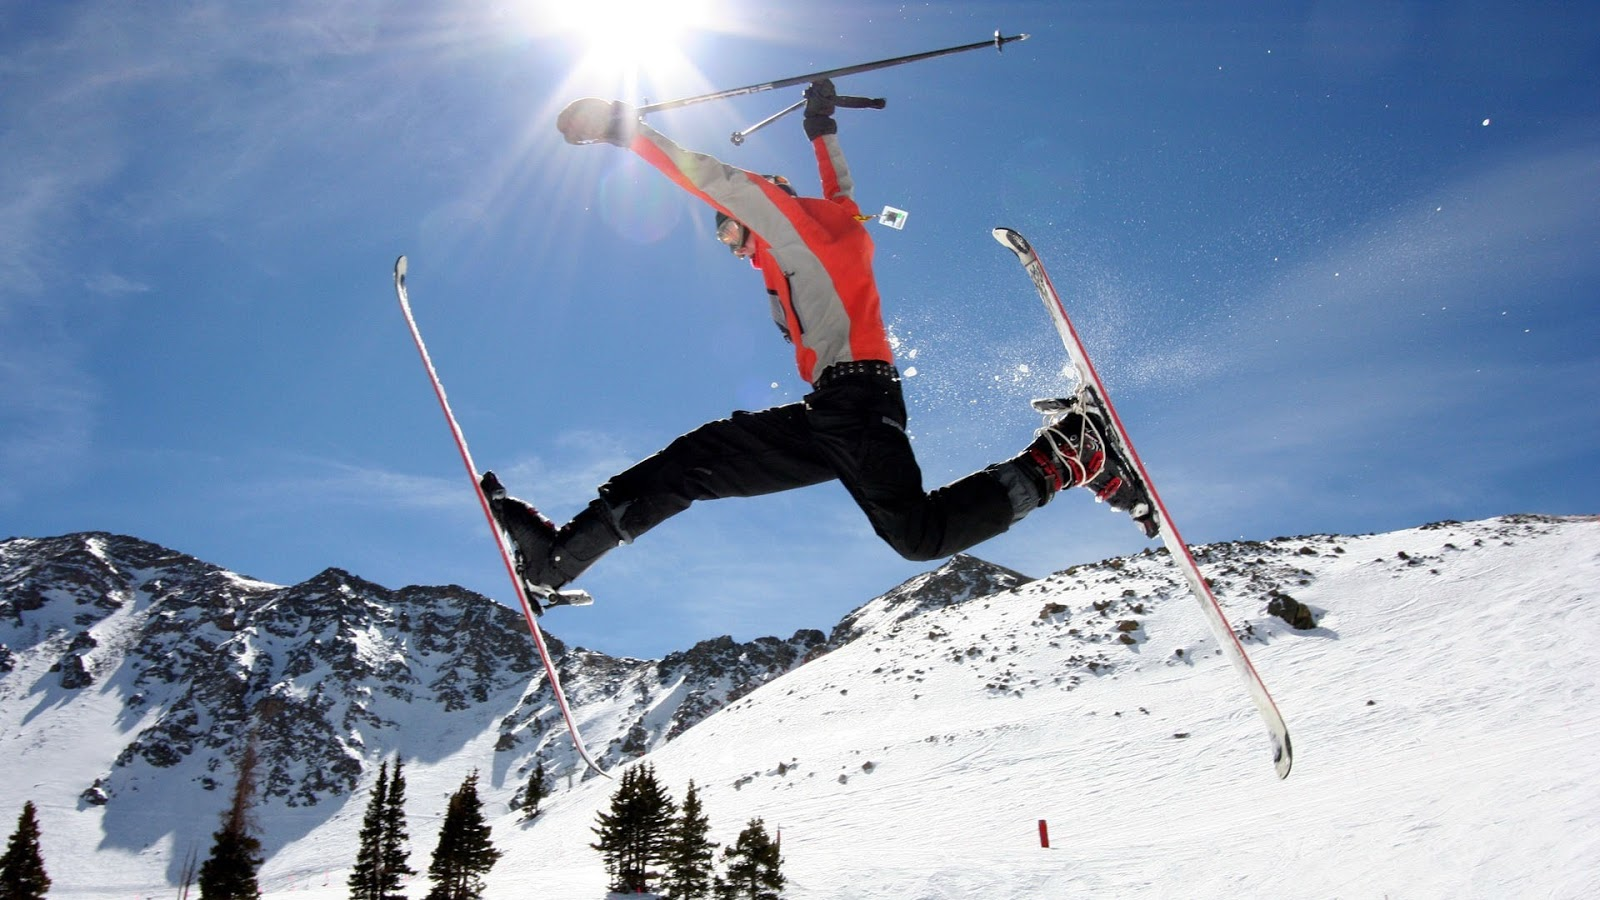 http://4.bp.blogspot.com/-W1EDEeTGf_8/UKohtHMLQMI/AAAAAAAAHL0/QOA1zmqzmD4/s1600/Ski_Wallpaper_4.jpg